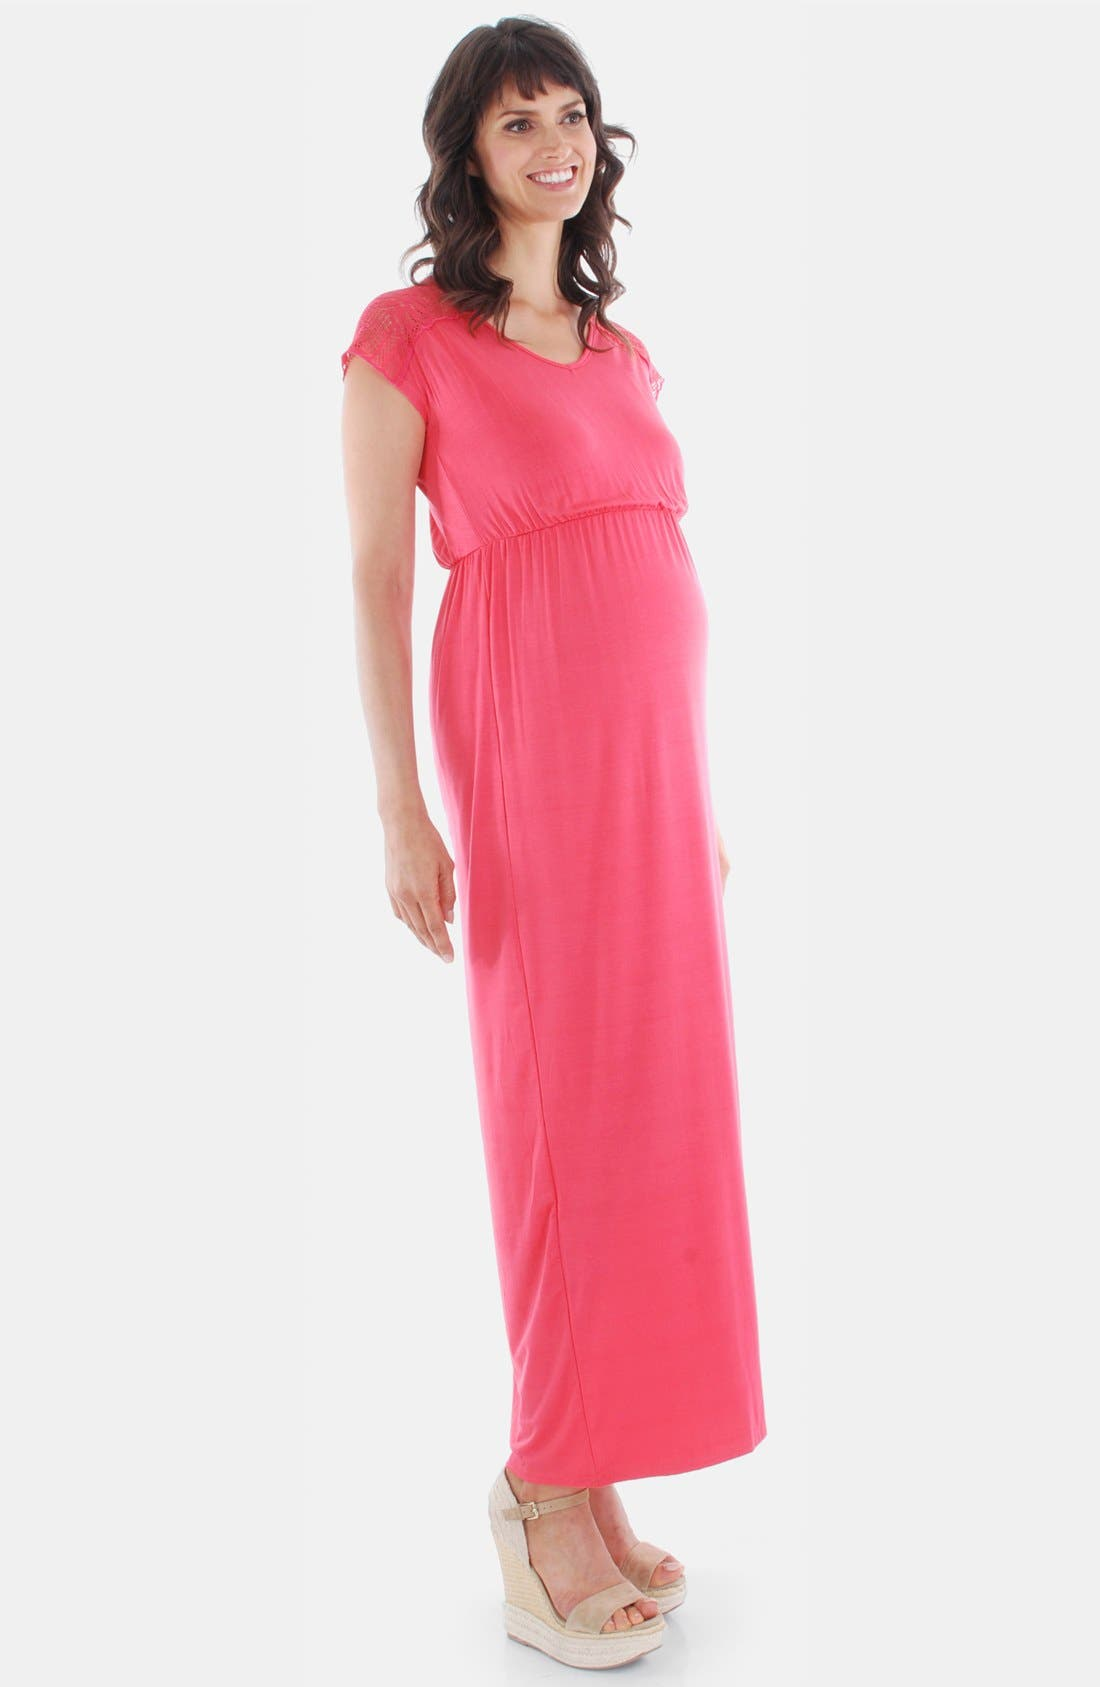 Main Image - Everly Grey Lace Yoke Maxi Maternity Dress